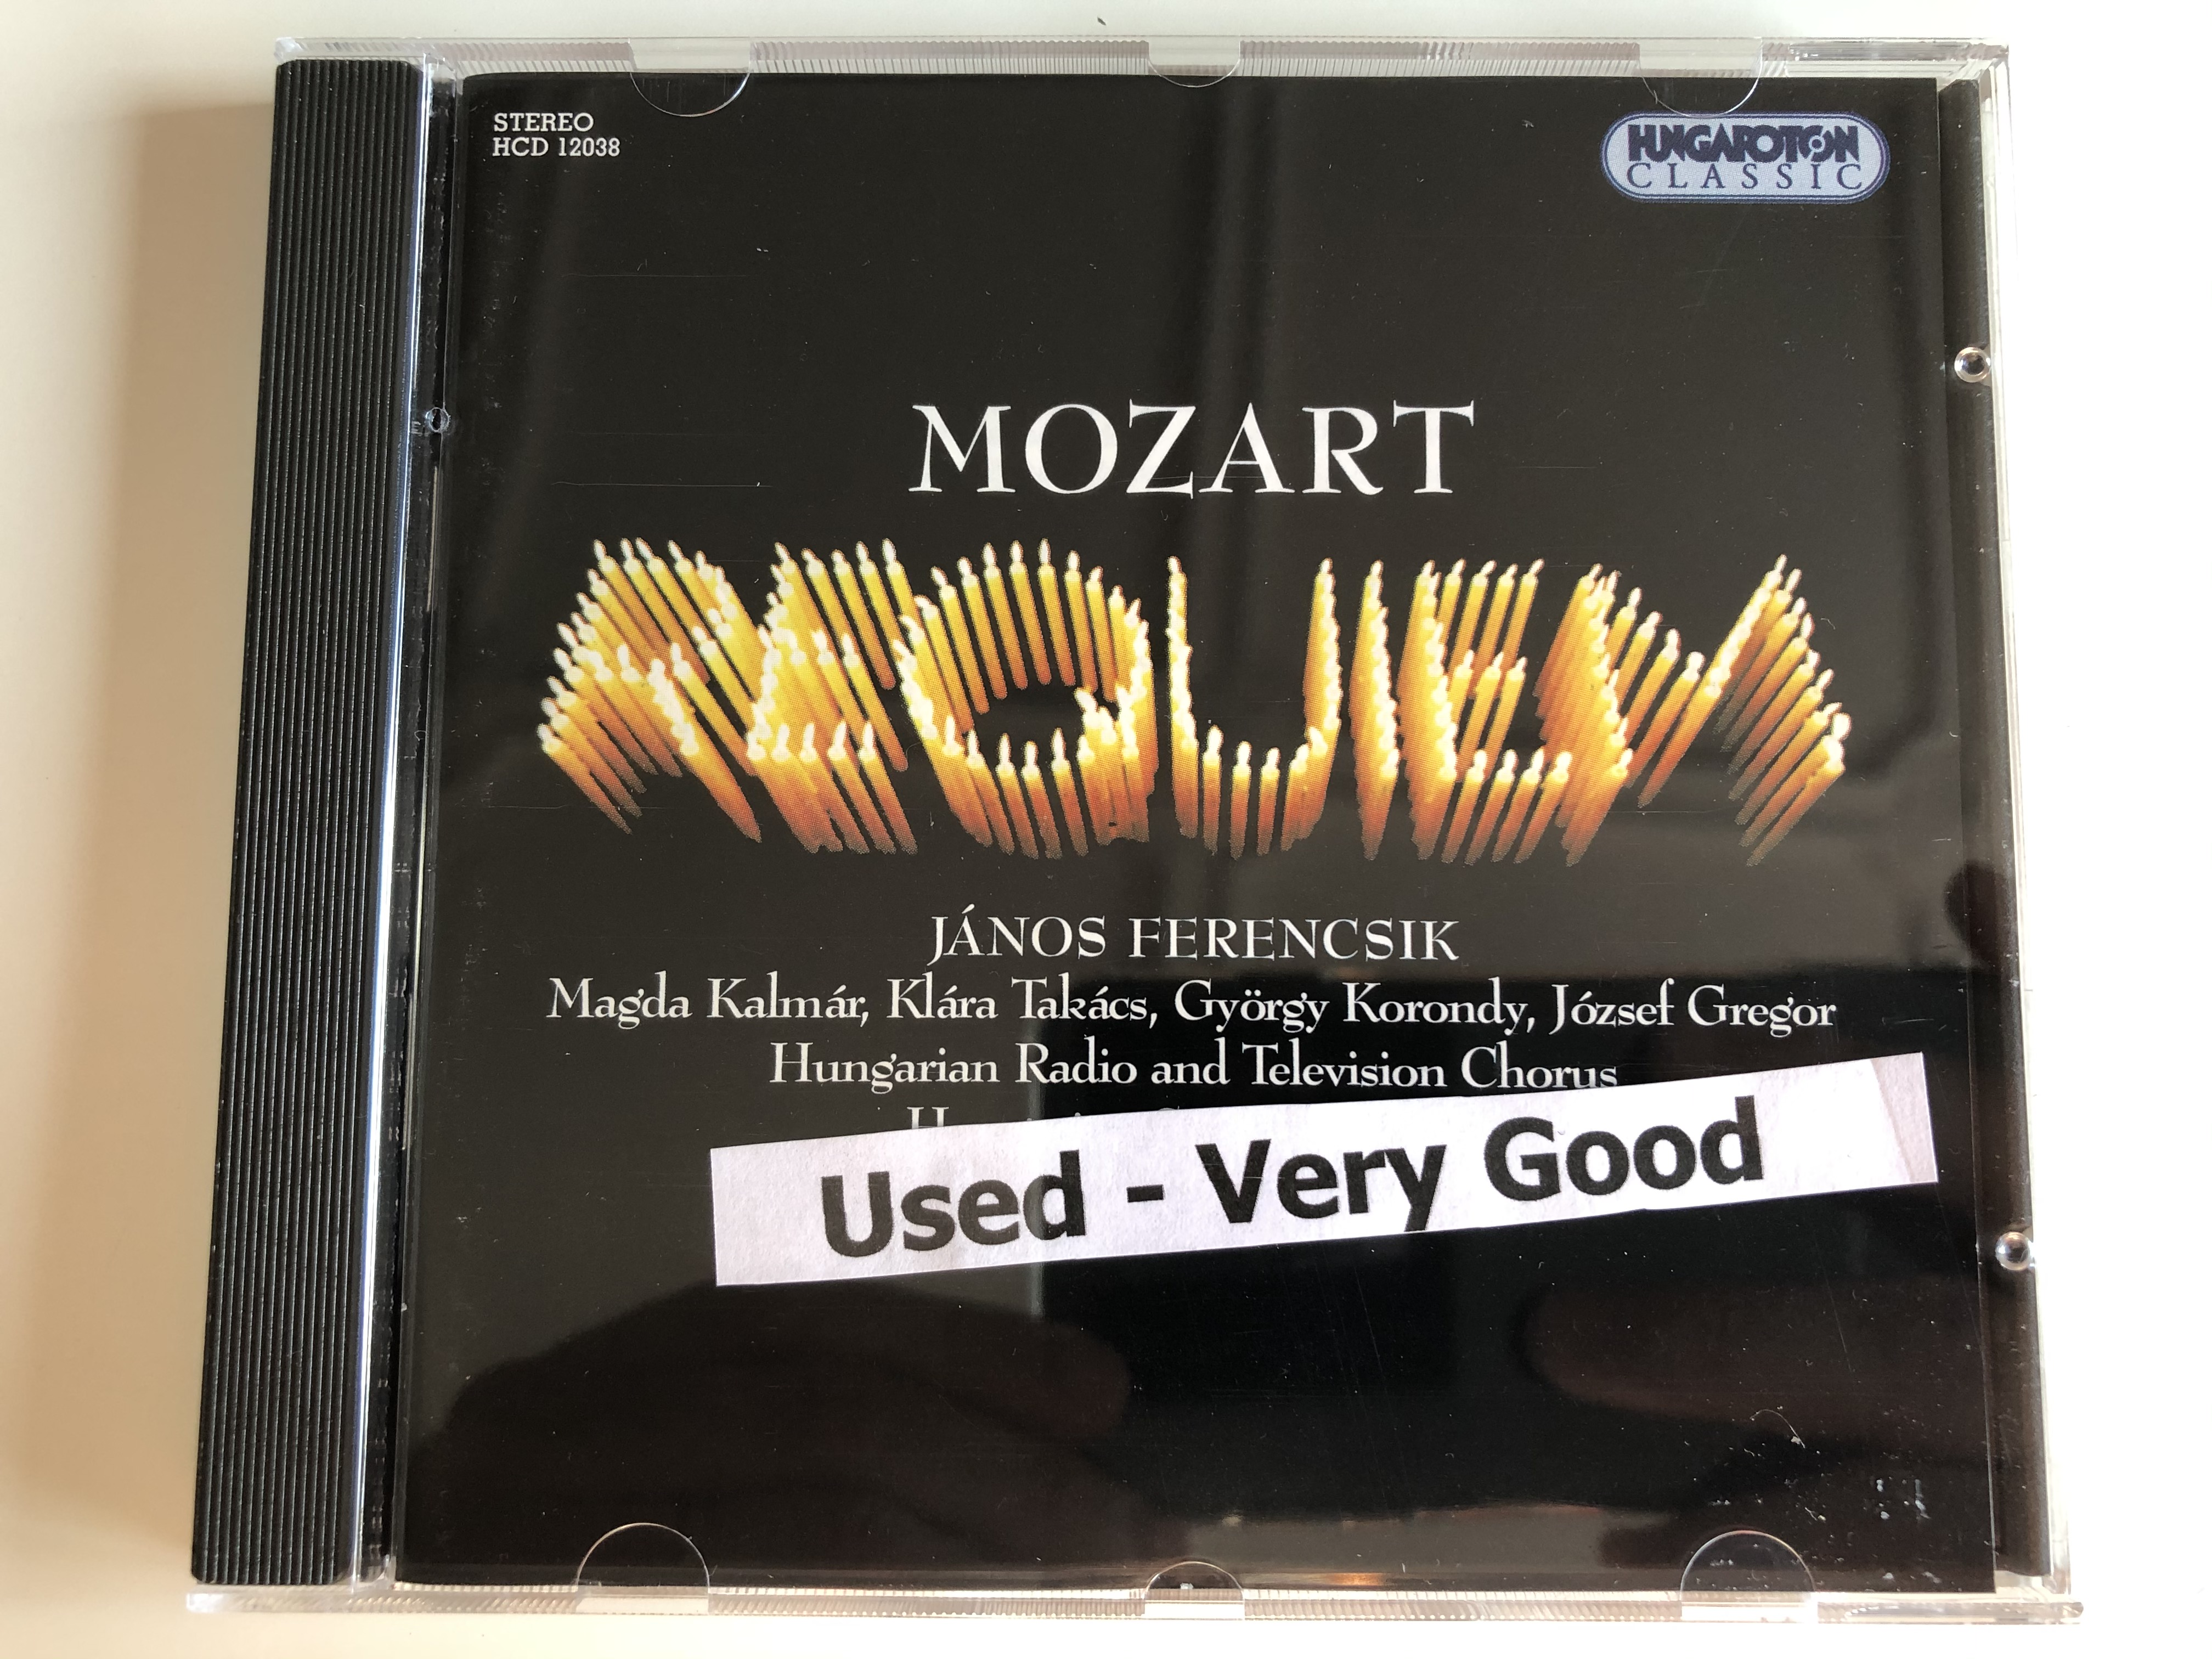 mozart-requiem-j-nos-ferencsik-magda-kalm-r-kl-ra-tak-cs-gy-rgy-korondy-j-zsef-gregor-hungarian-radio-and-television-chorus-hungarian-state-orchestra-hungaroton-classic-audio-cd-19-11-.jpg